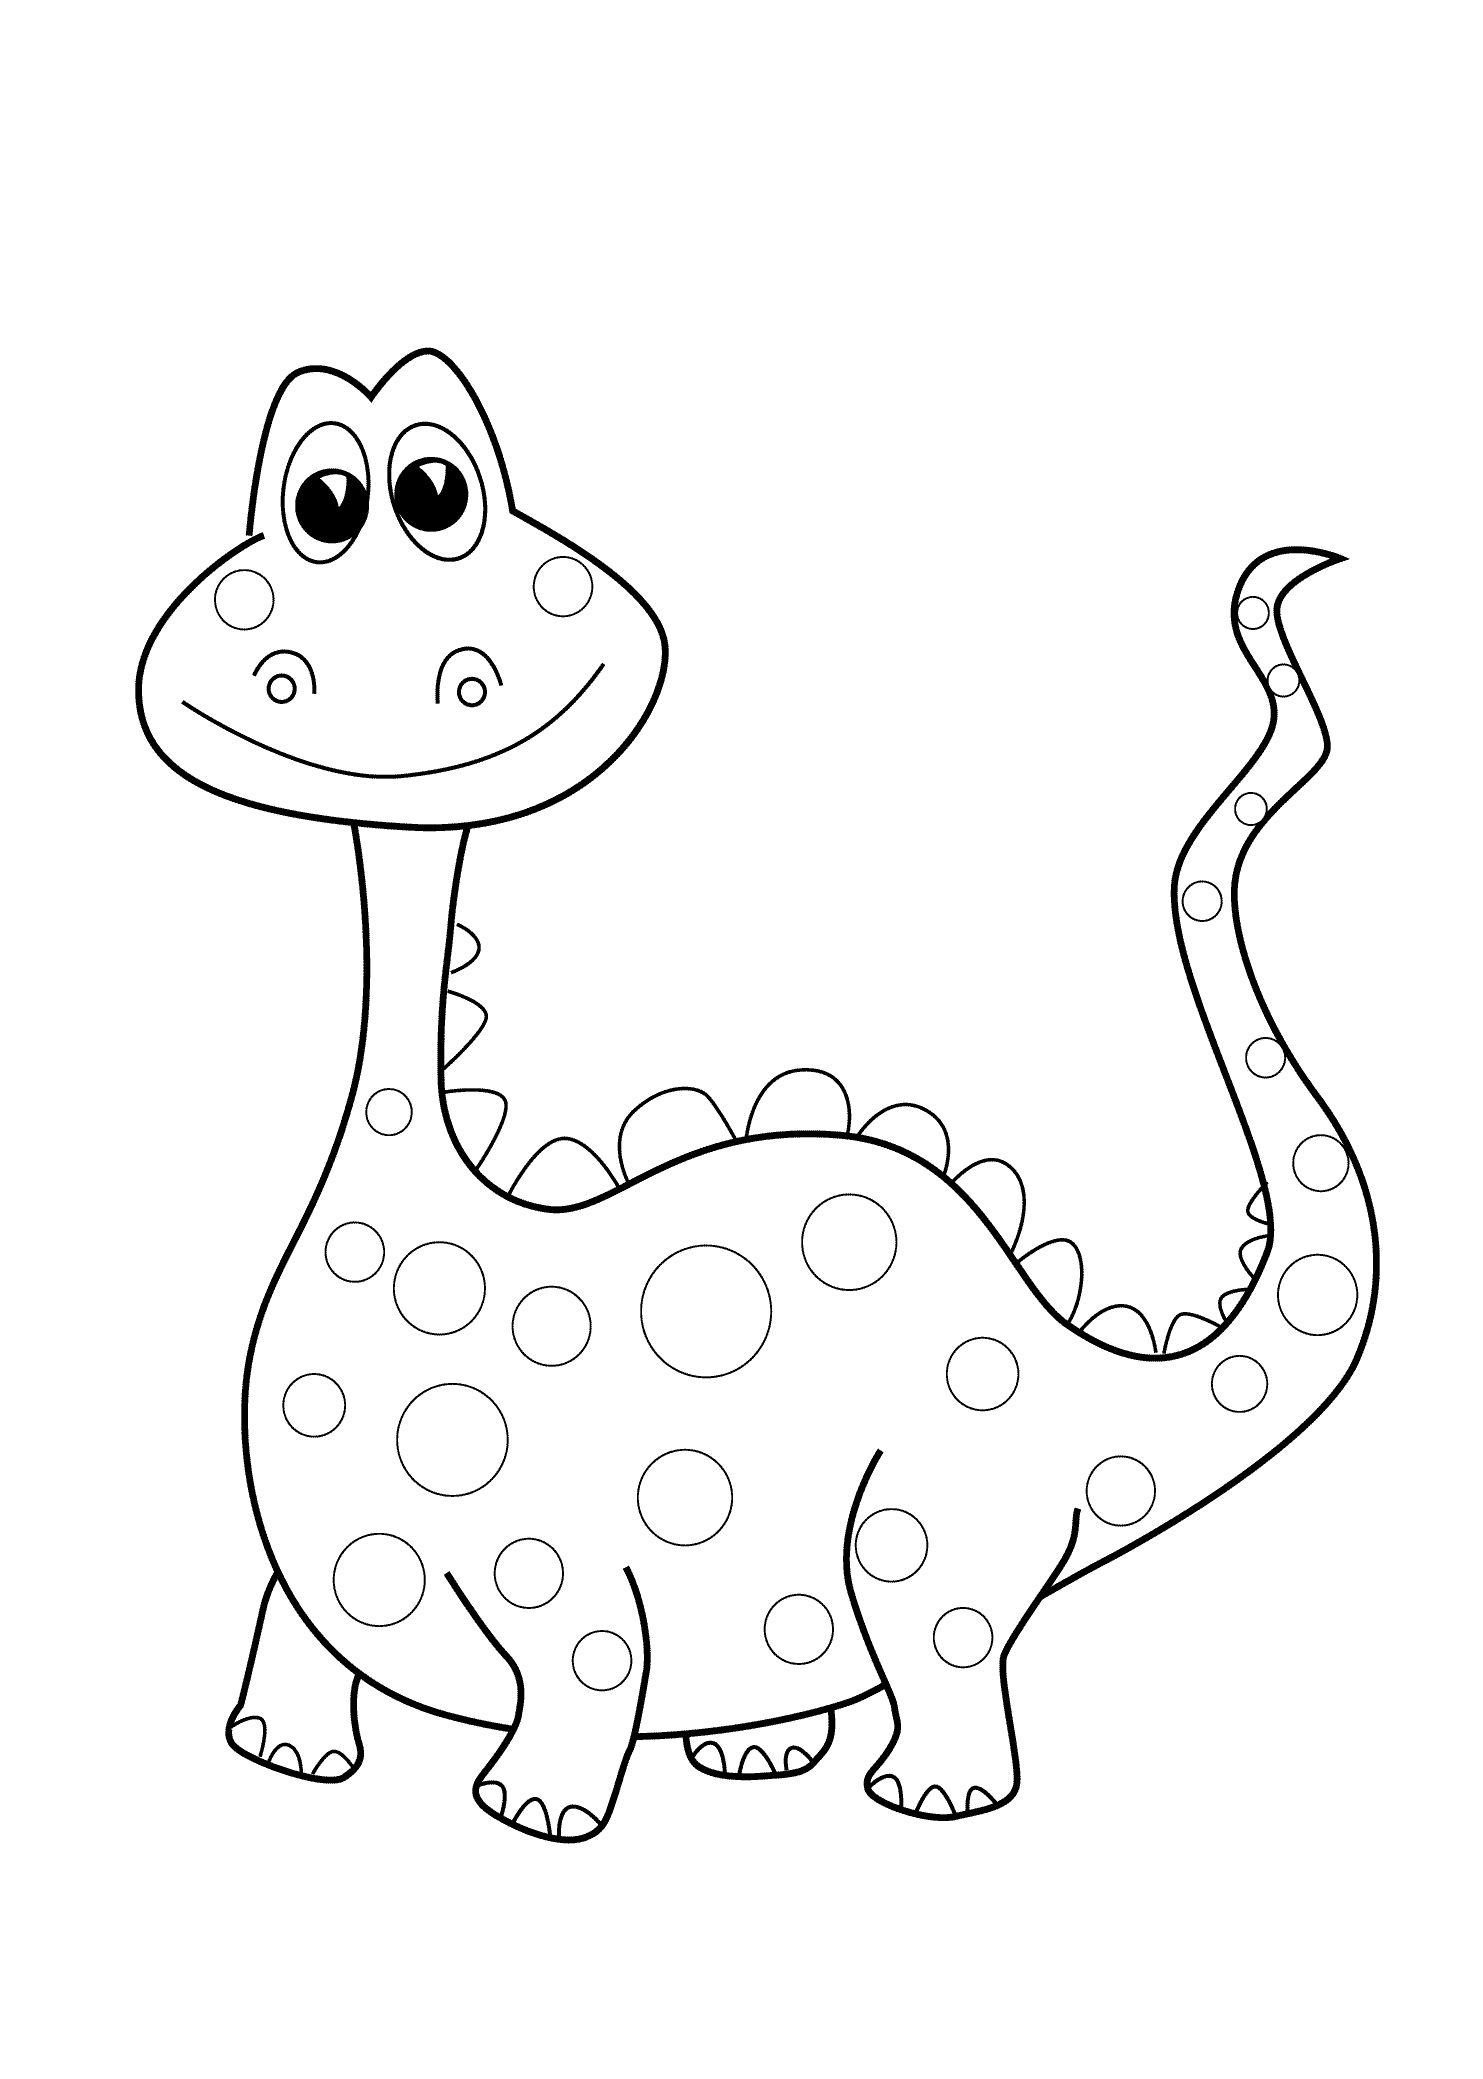 Preschool Dinosaur Coloring Pages Printable